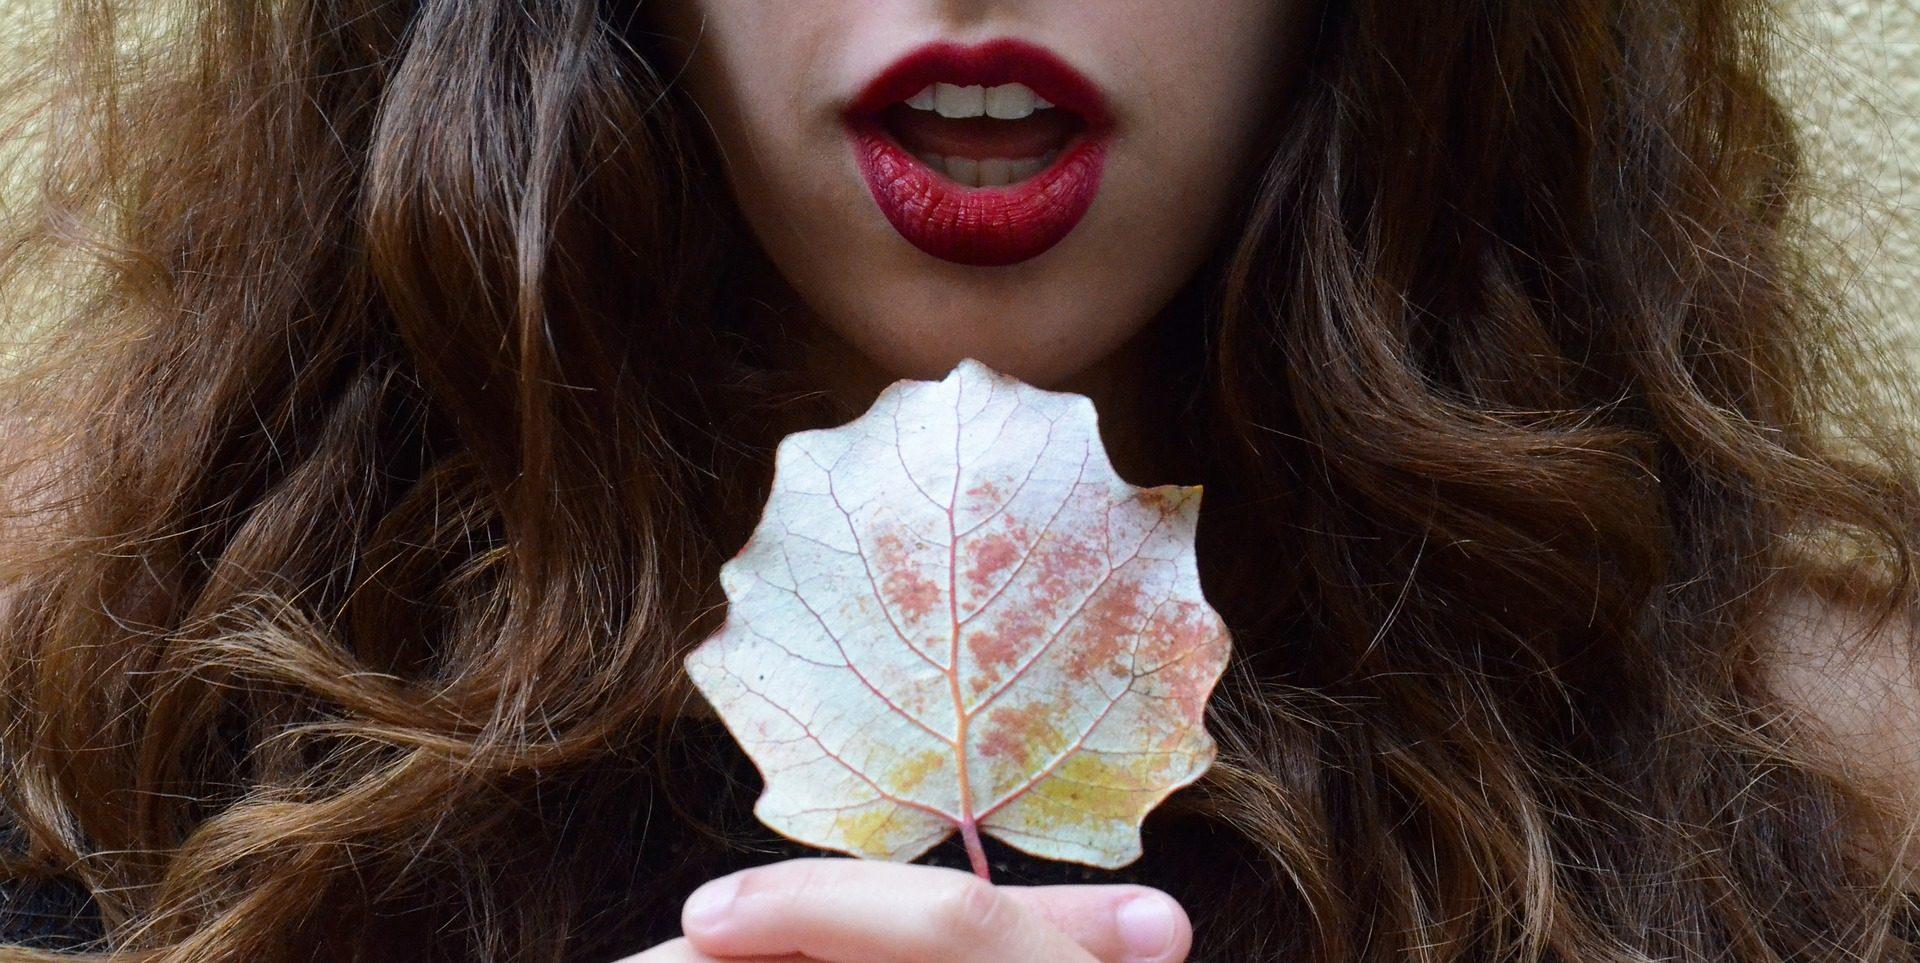 mujer, boca, labios, rojos, hoja, pelo, manos - Fondos de Pantalla HD - professor-falken.com